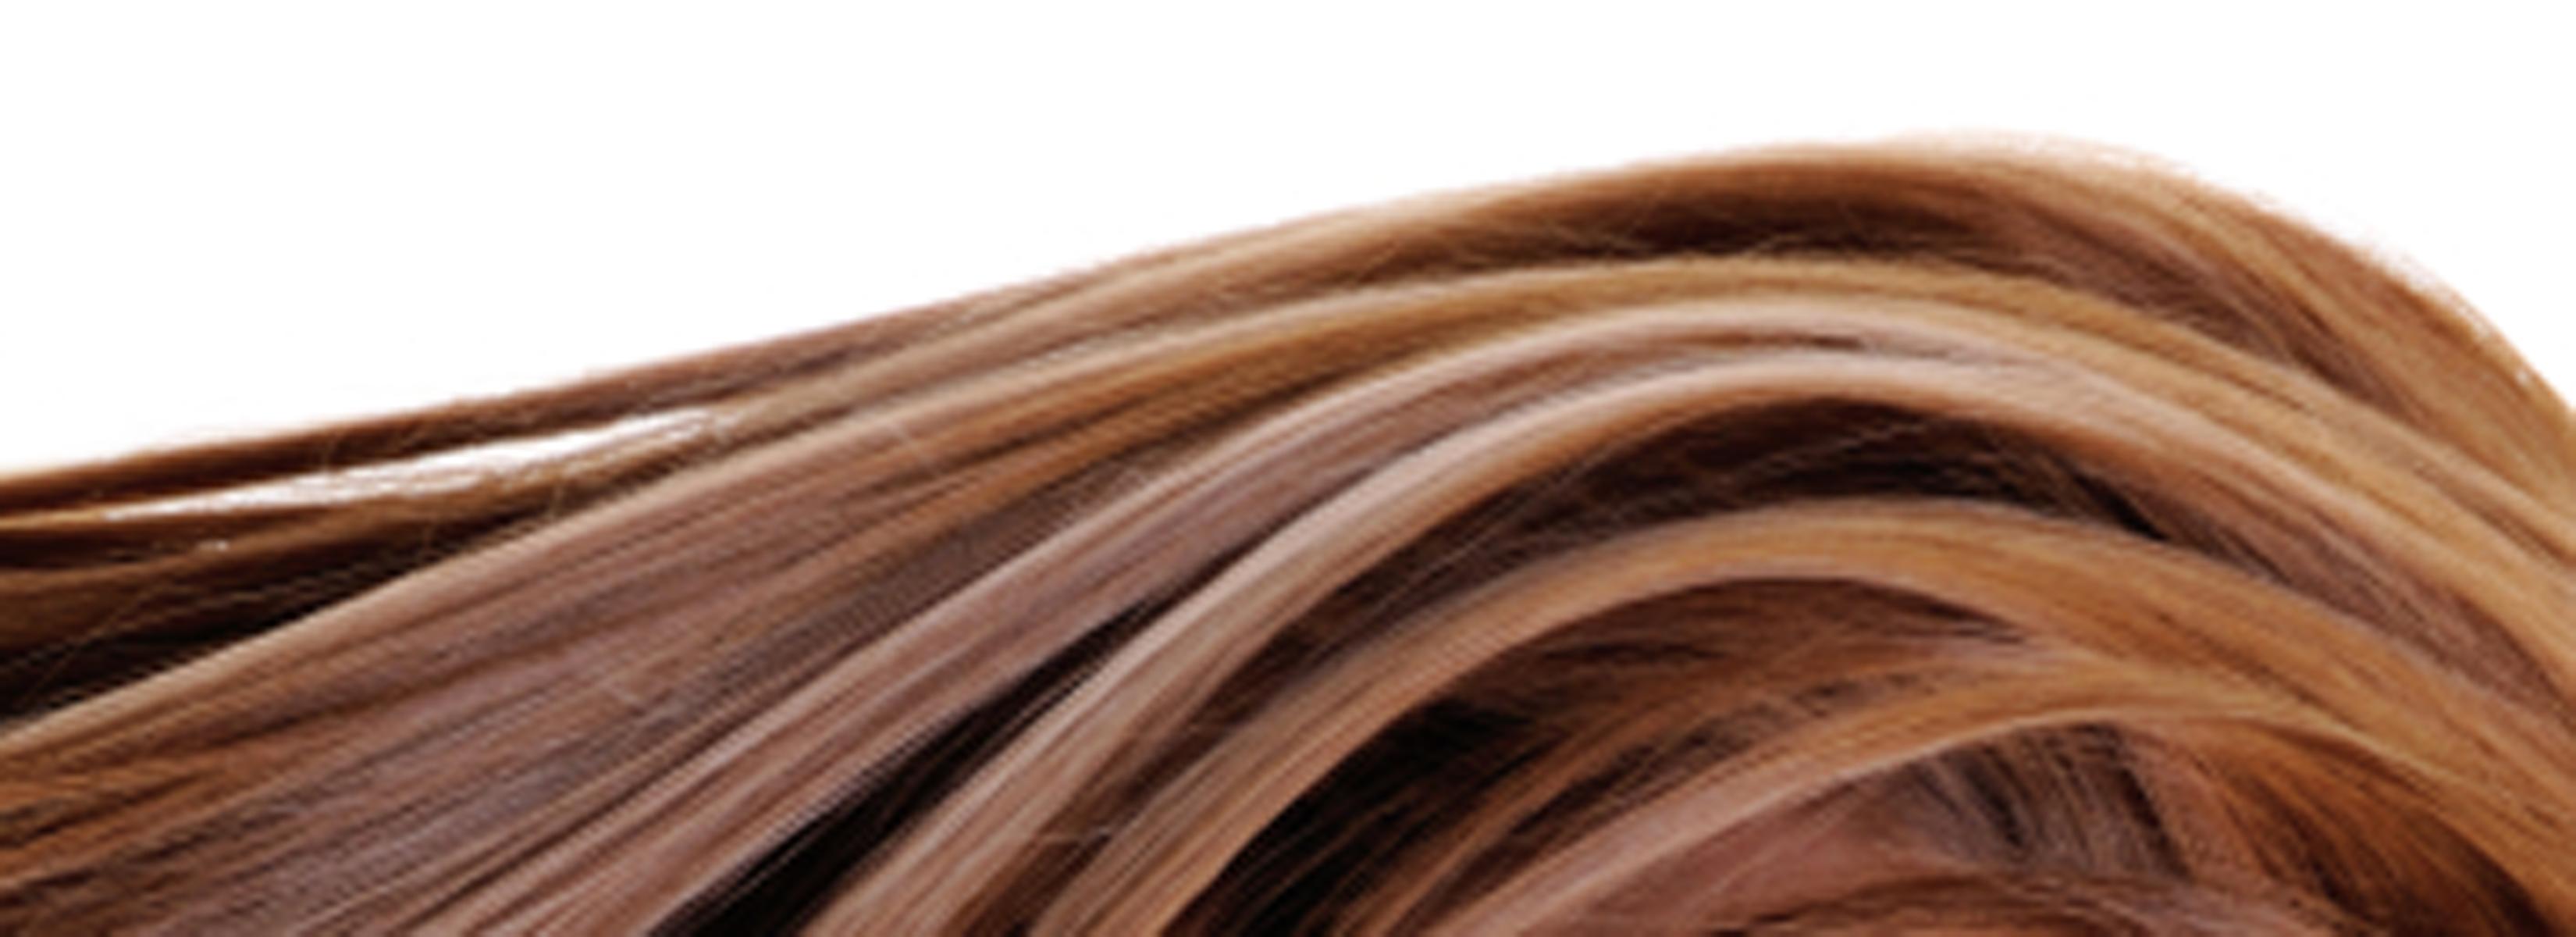 Hair extensions salon charlotte nc photo ideas with best hair growth